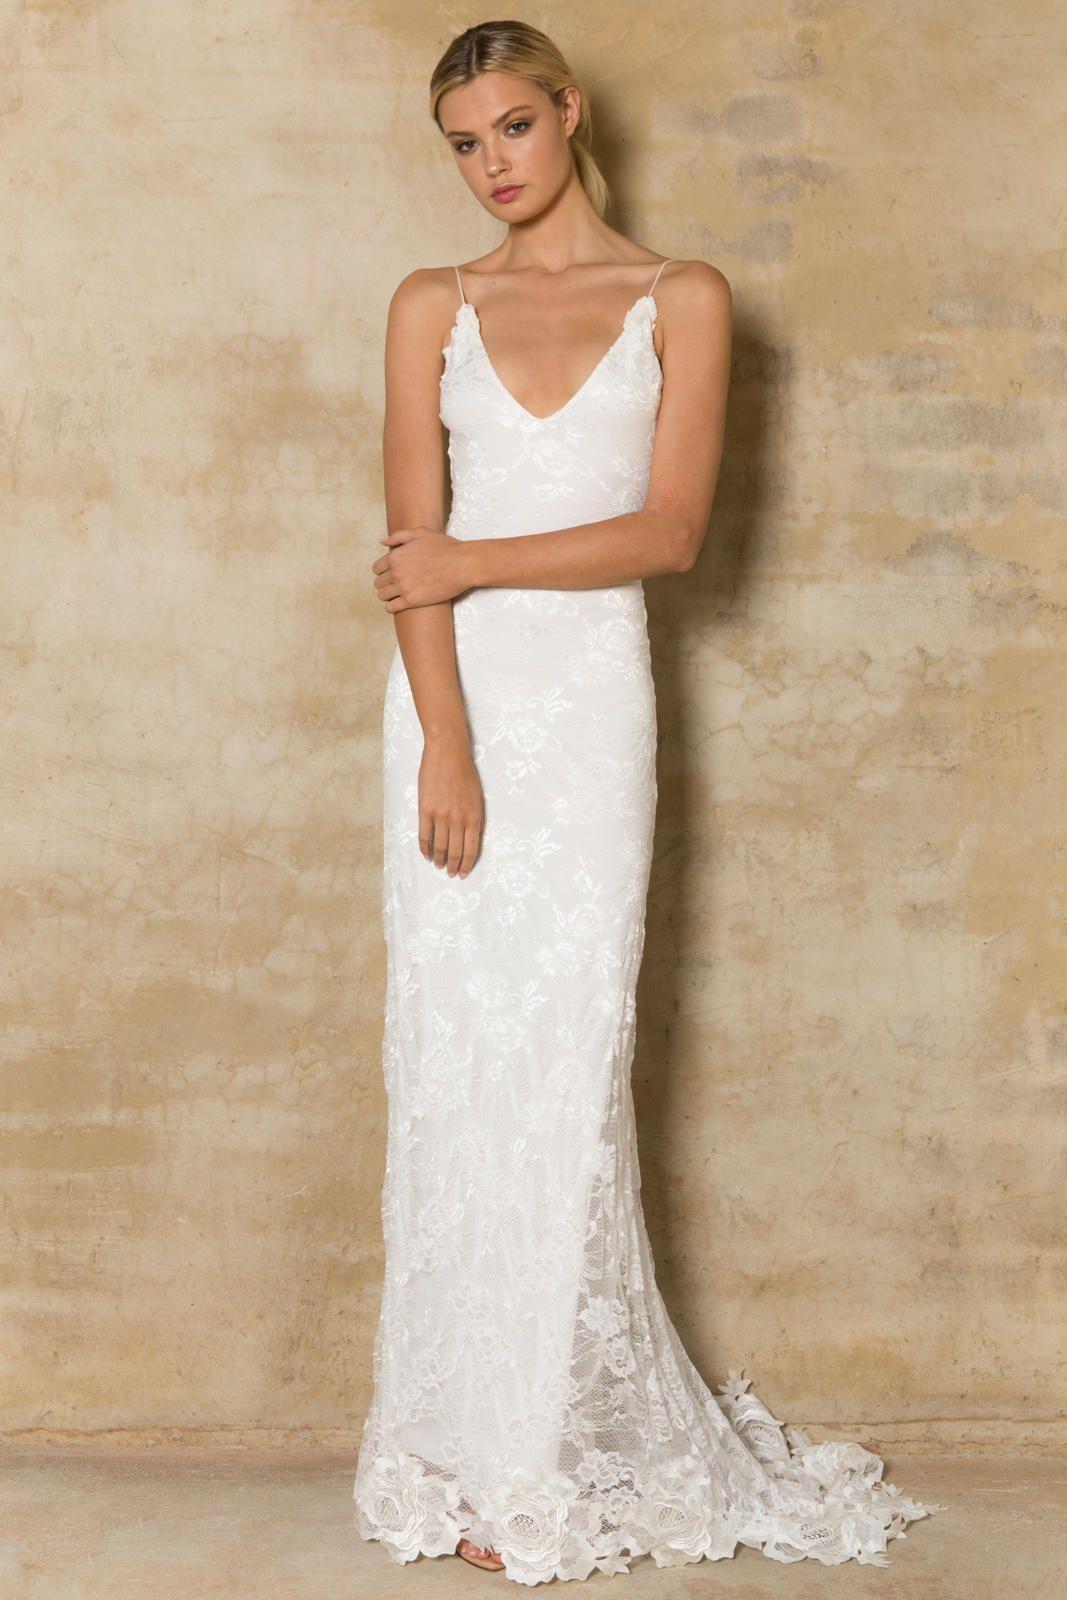 Cool amazing grace loves lace wedding gown lottie dress